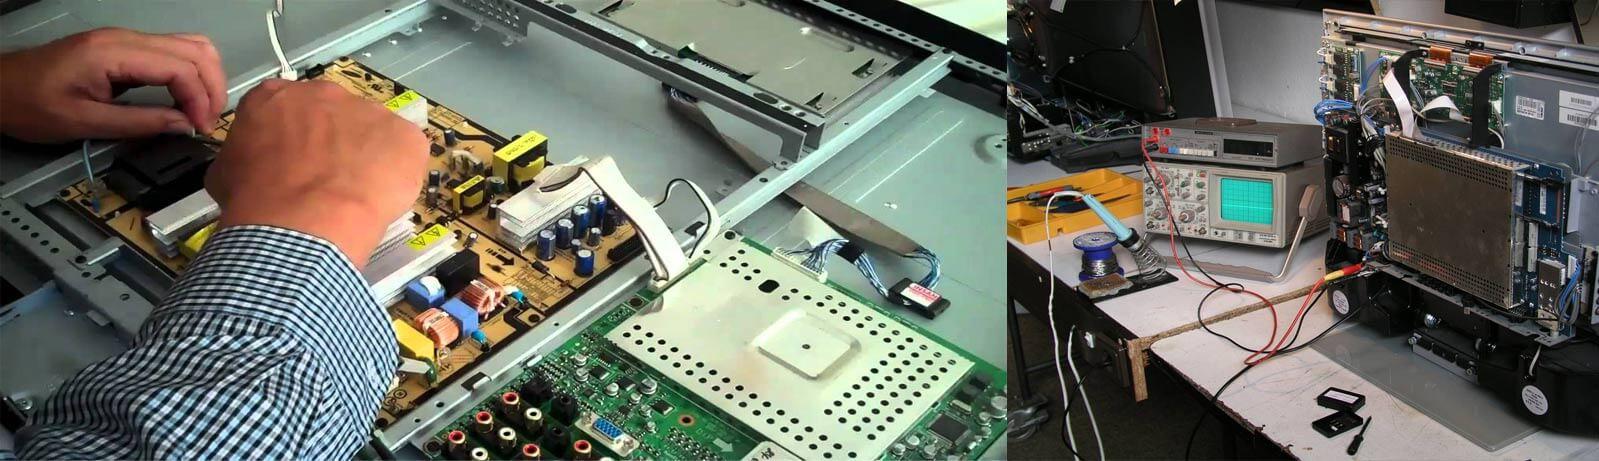 Television repairs perth